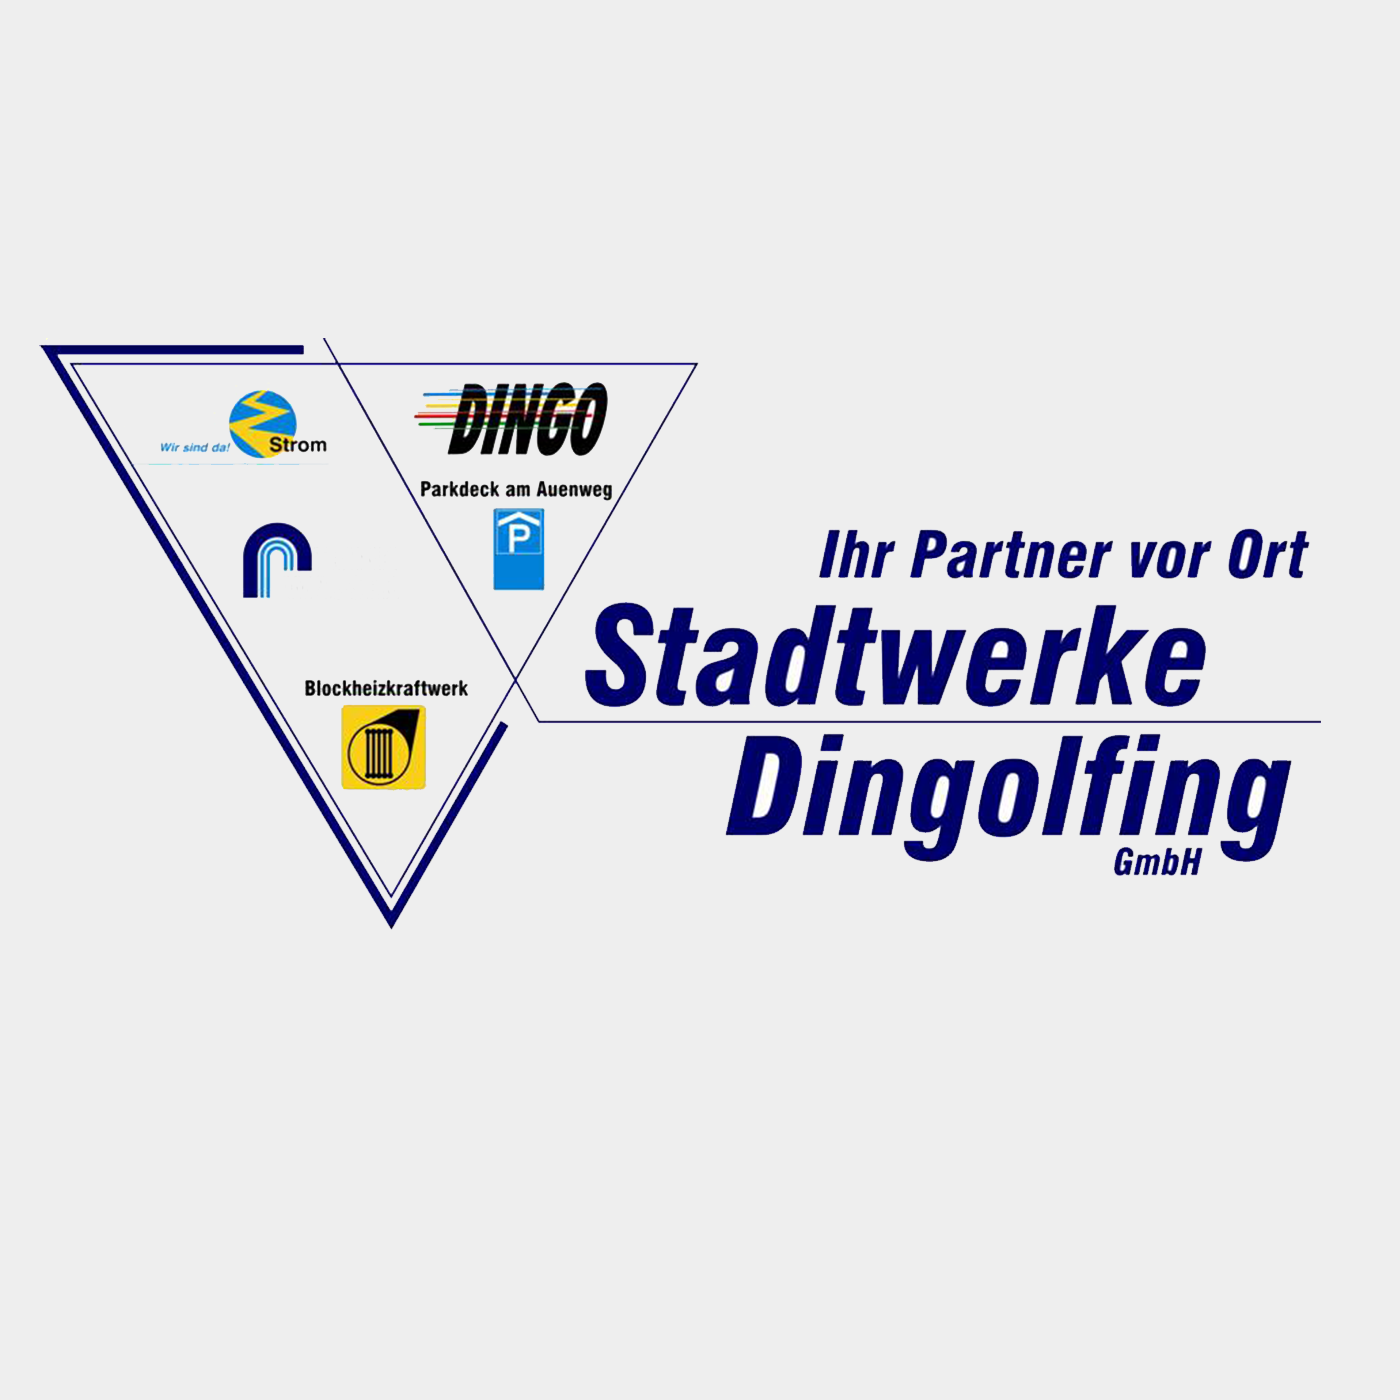 Stadtwerke Dingolfing